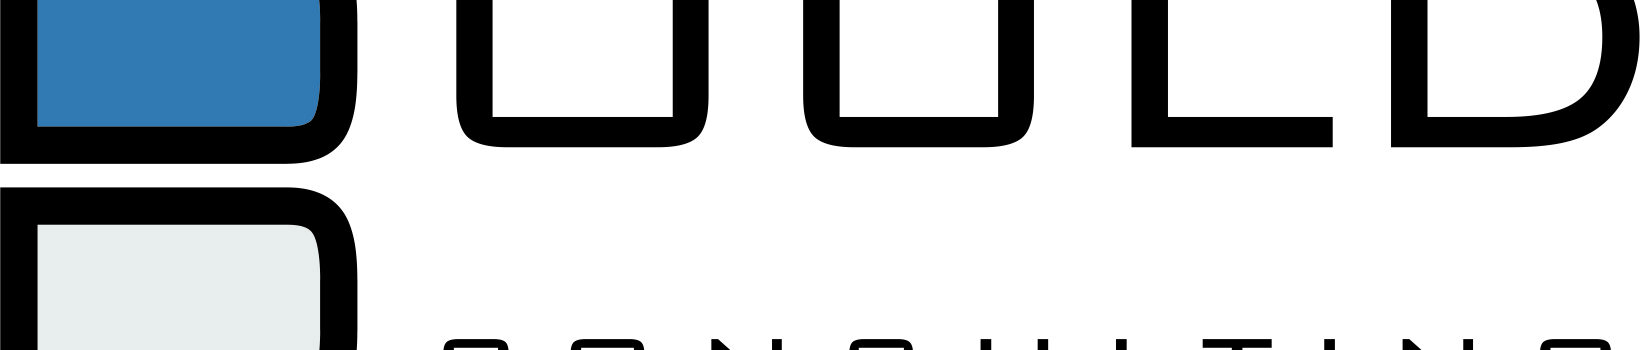 BCL Logo Larger - Copy